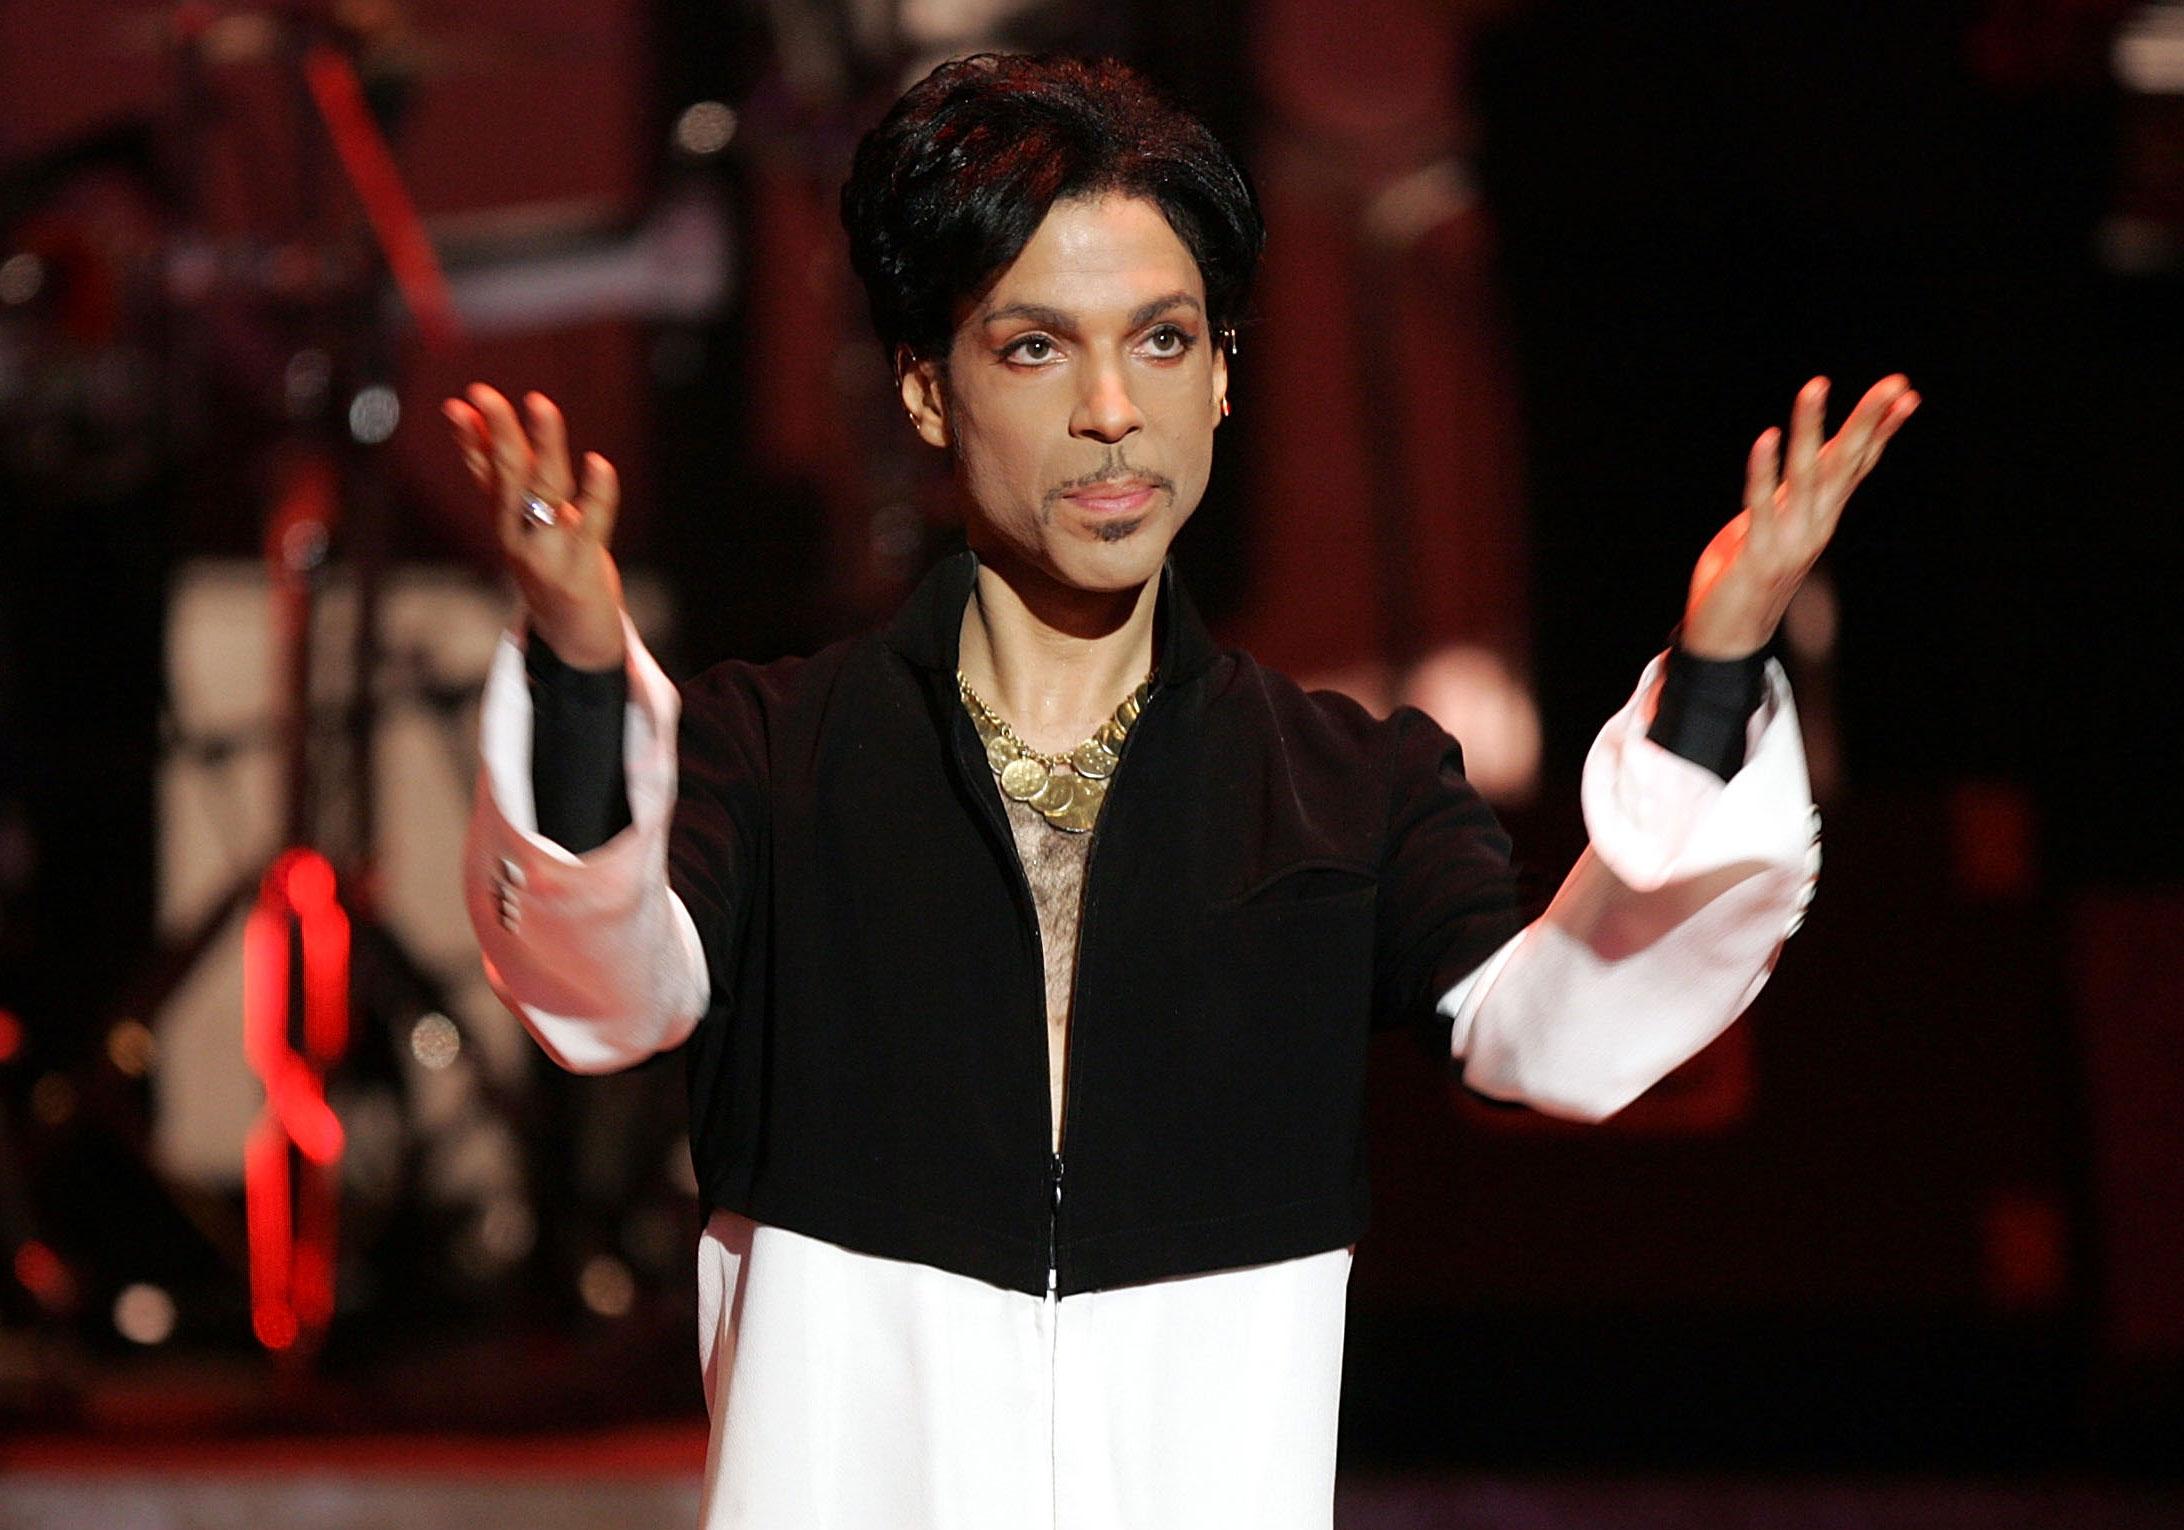 prince dead borther confession proud